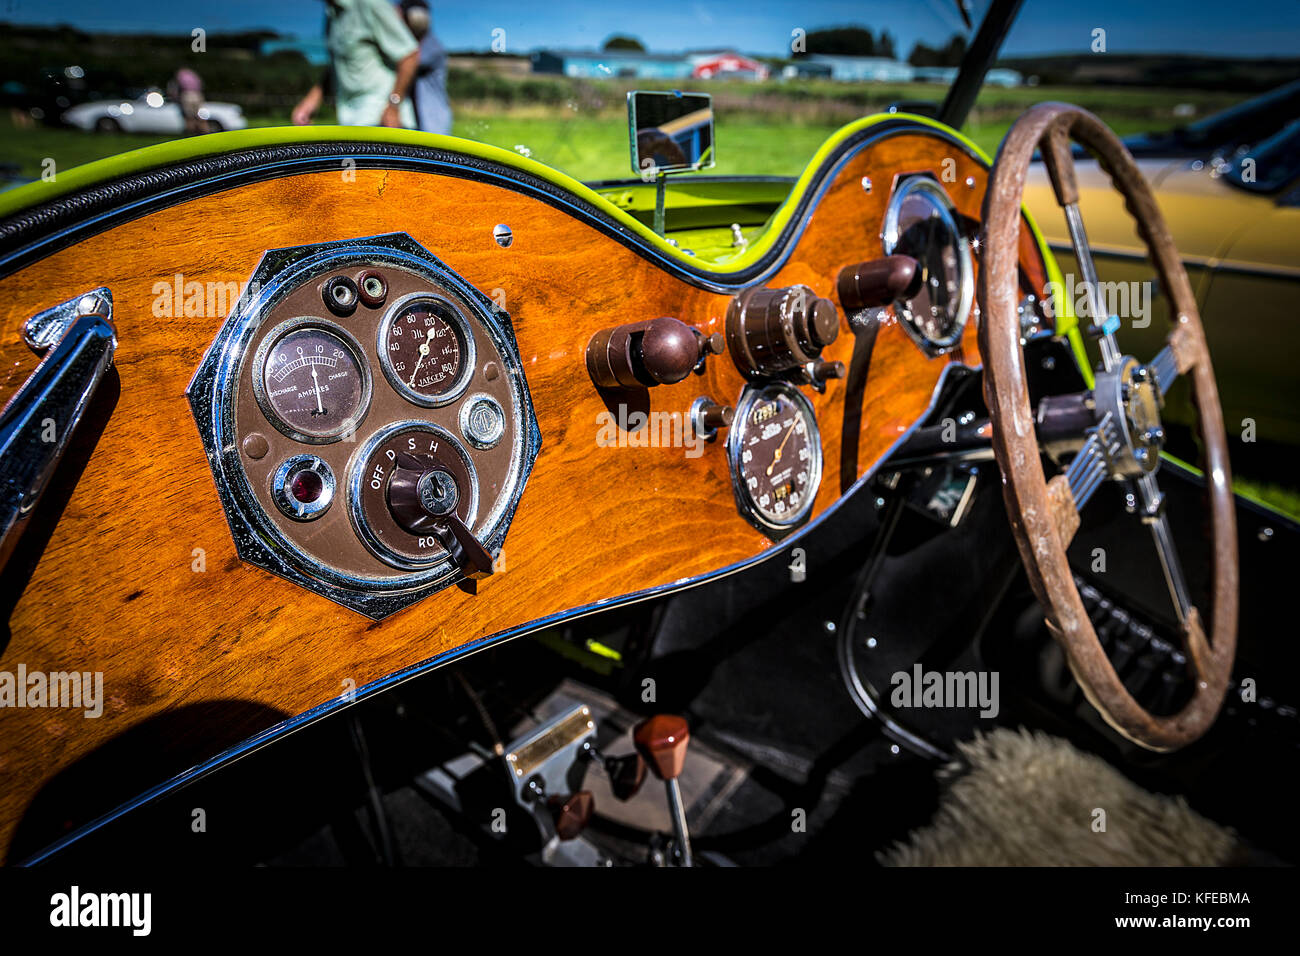 Morris Garages Cars Stock Photos & Morris Garages Cars Stock Images ...